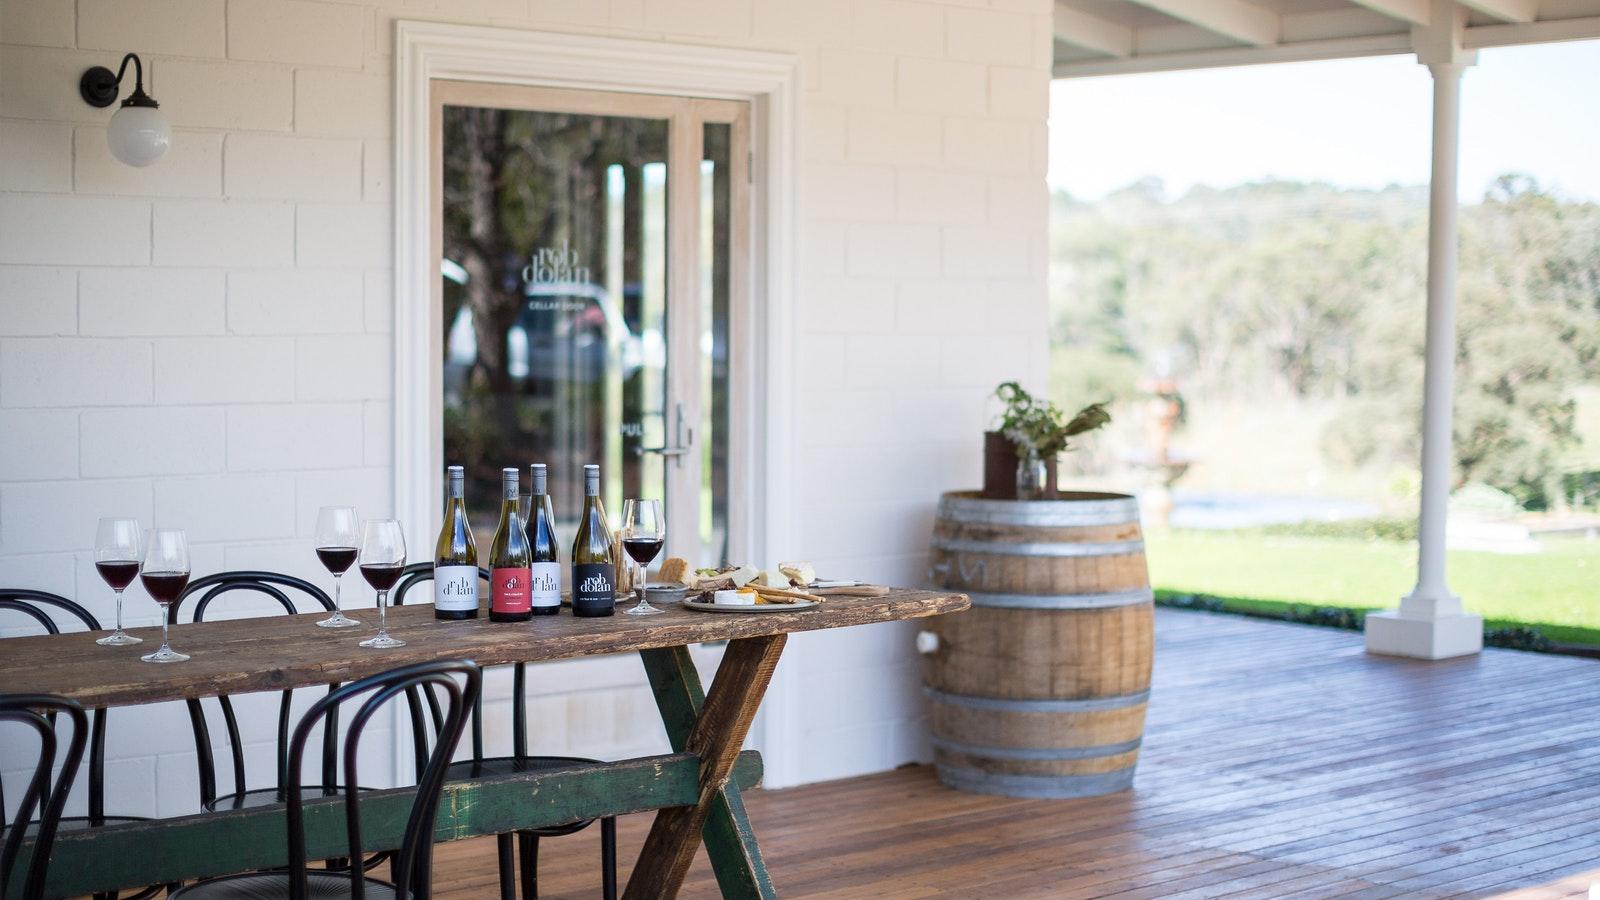 Rob Dolan Wines Deck